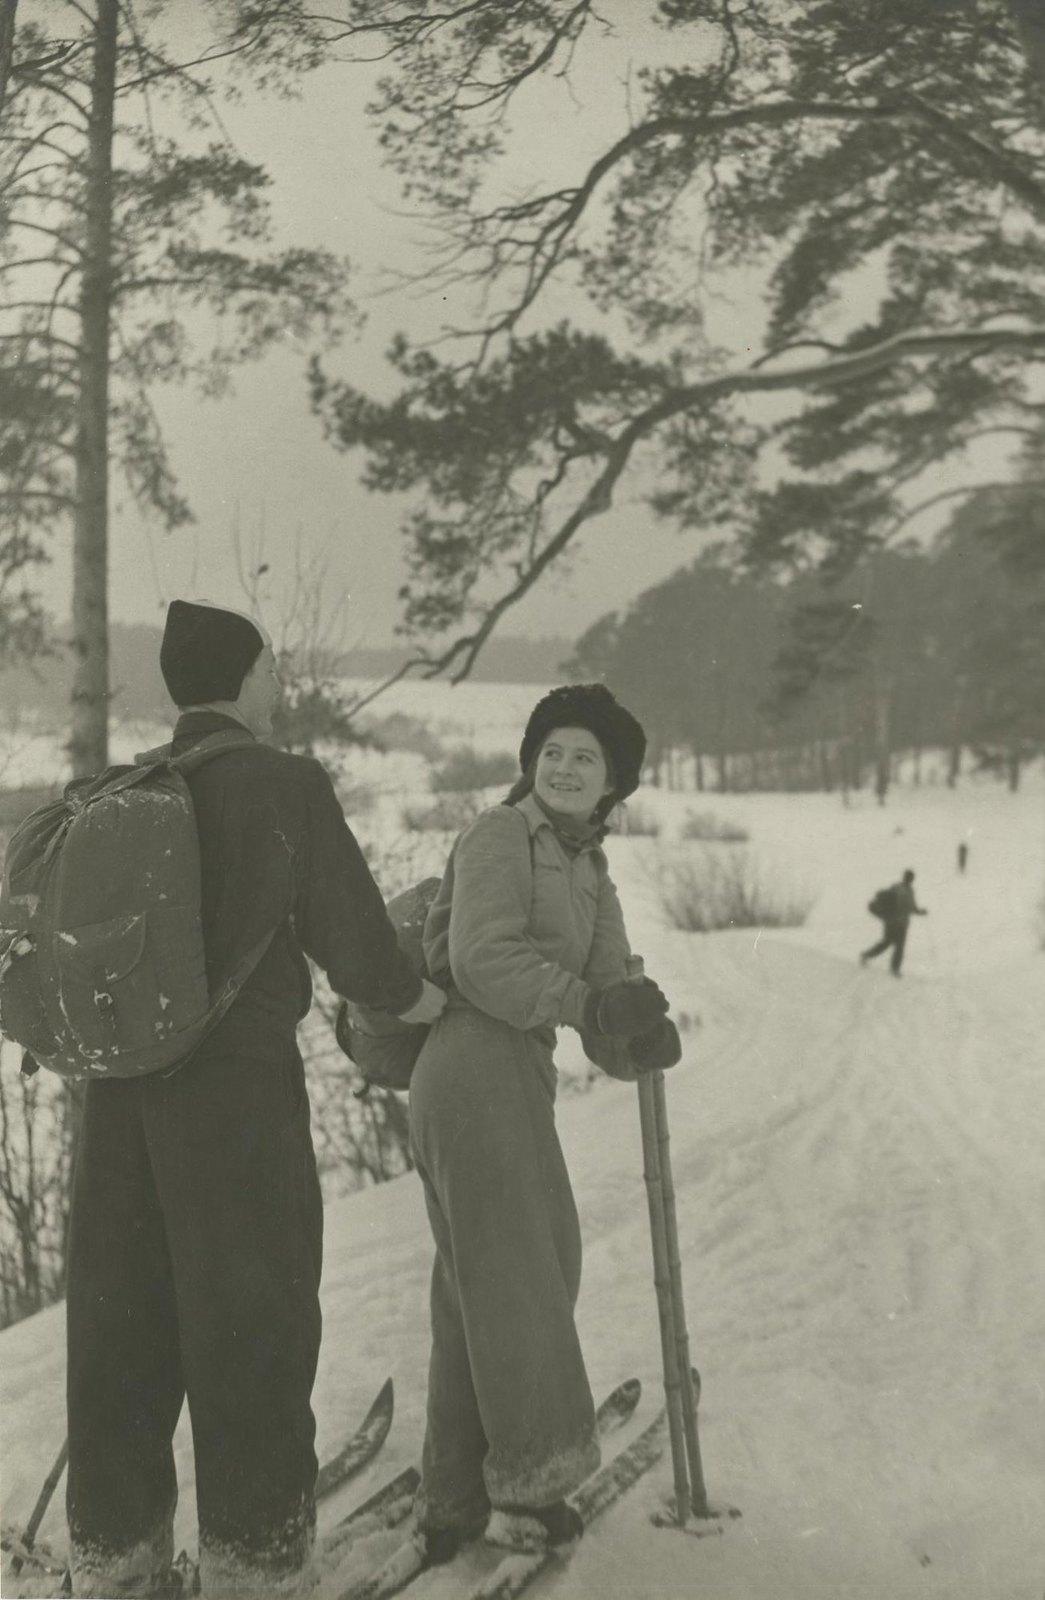 1940. Детский туризм